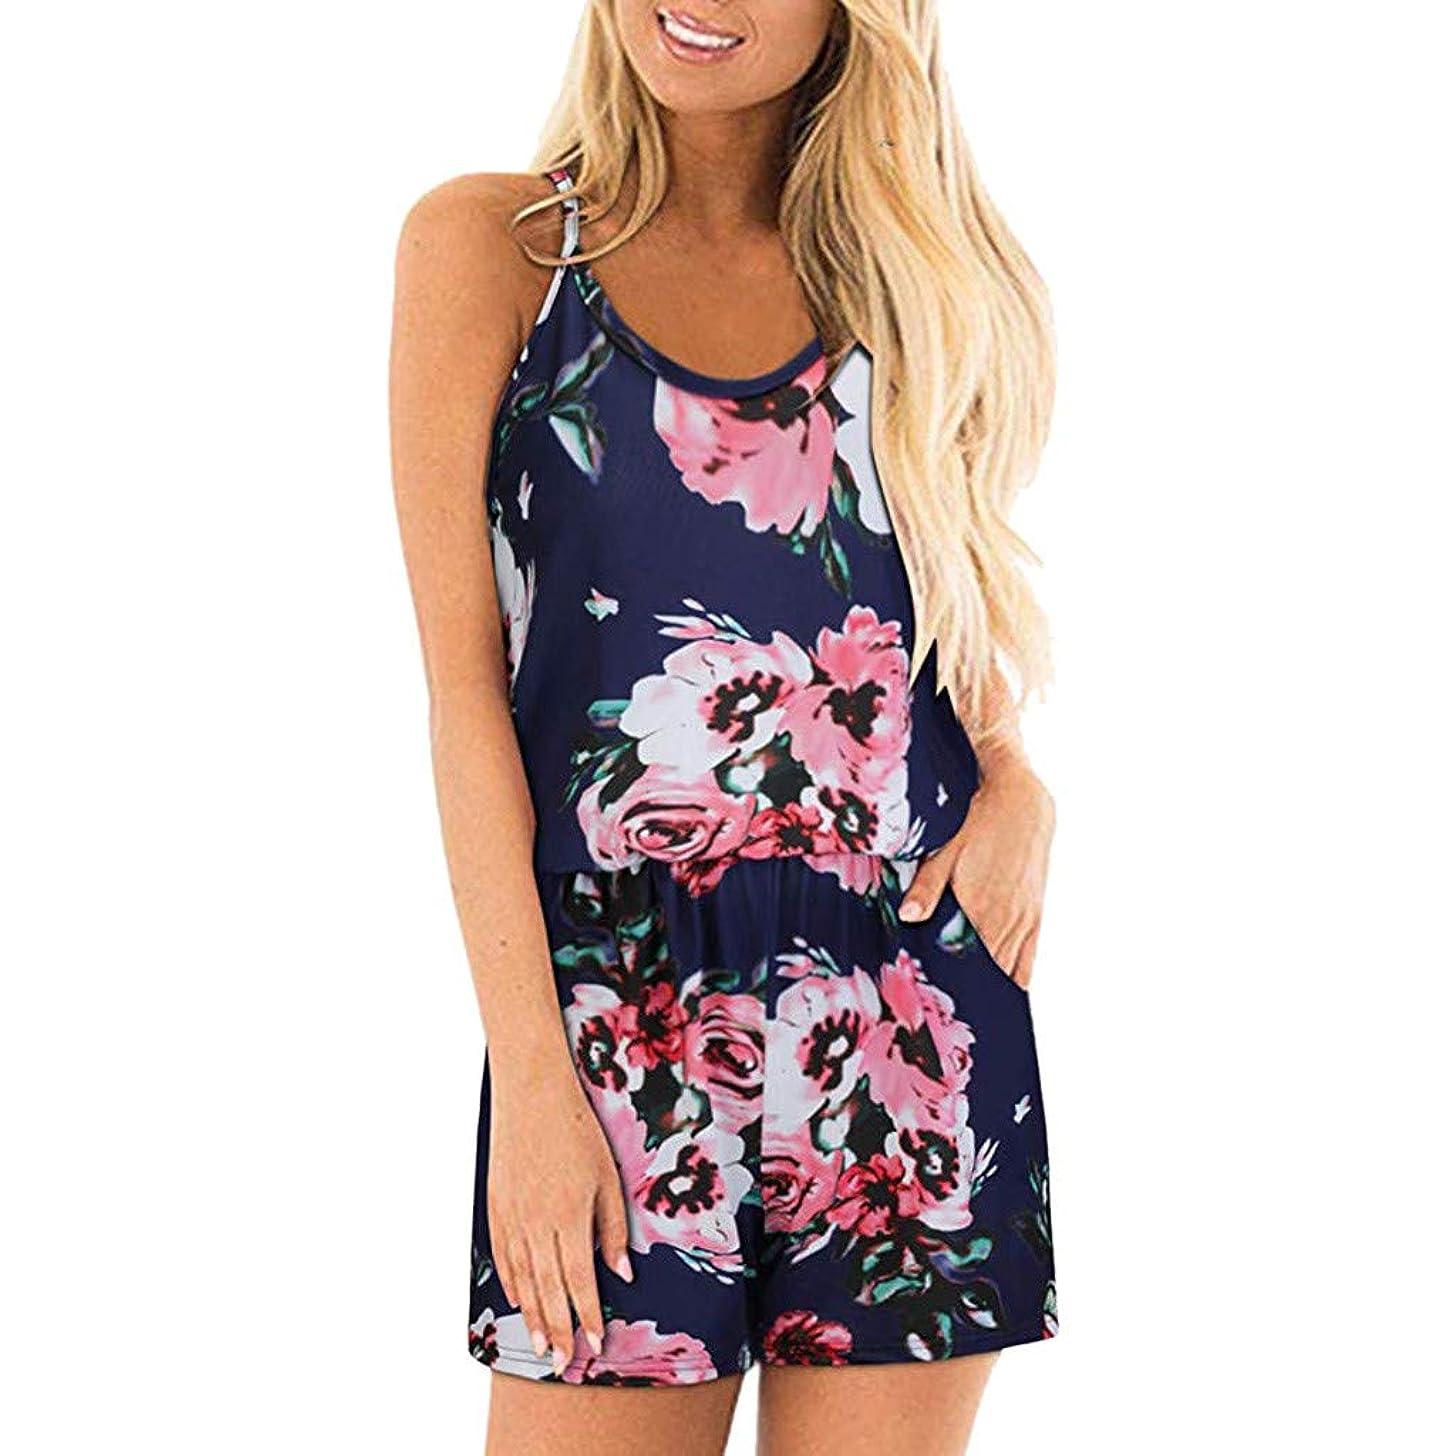 Sunhusing Women's Sleeveless Off Shoulder Spaghetti Strap Print Jumpsuit Drawstring Lace-Up Shorts Romper